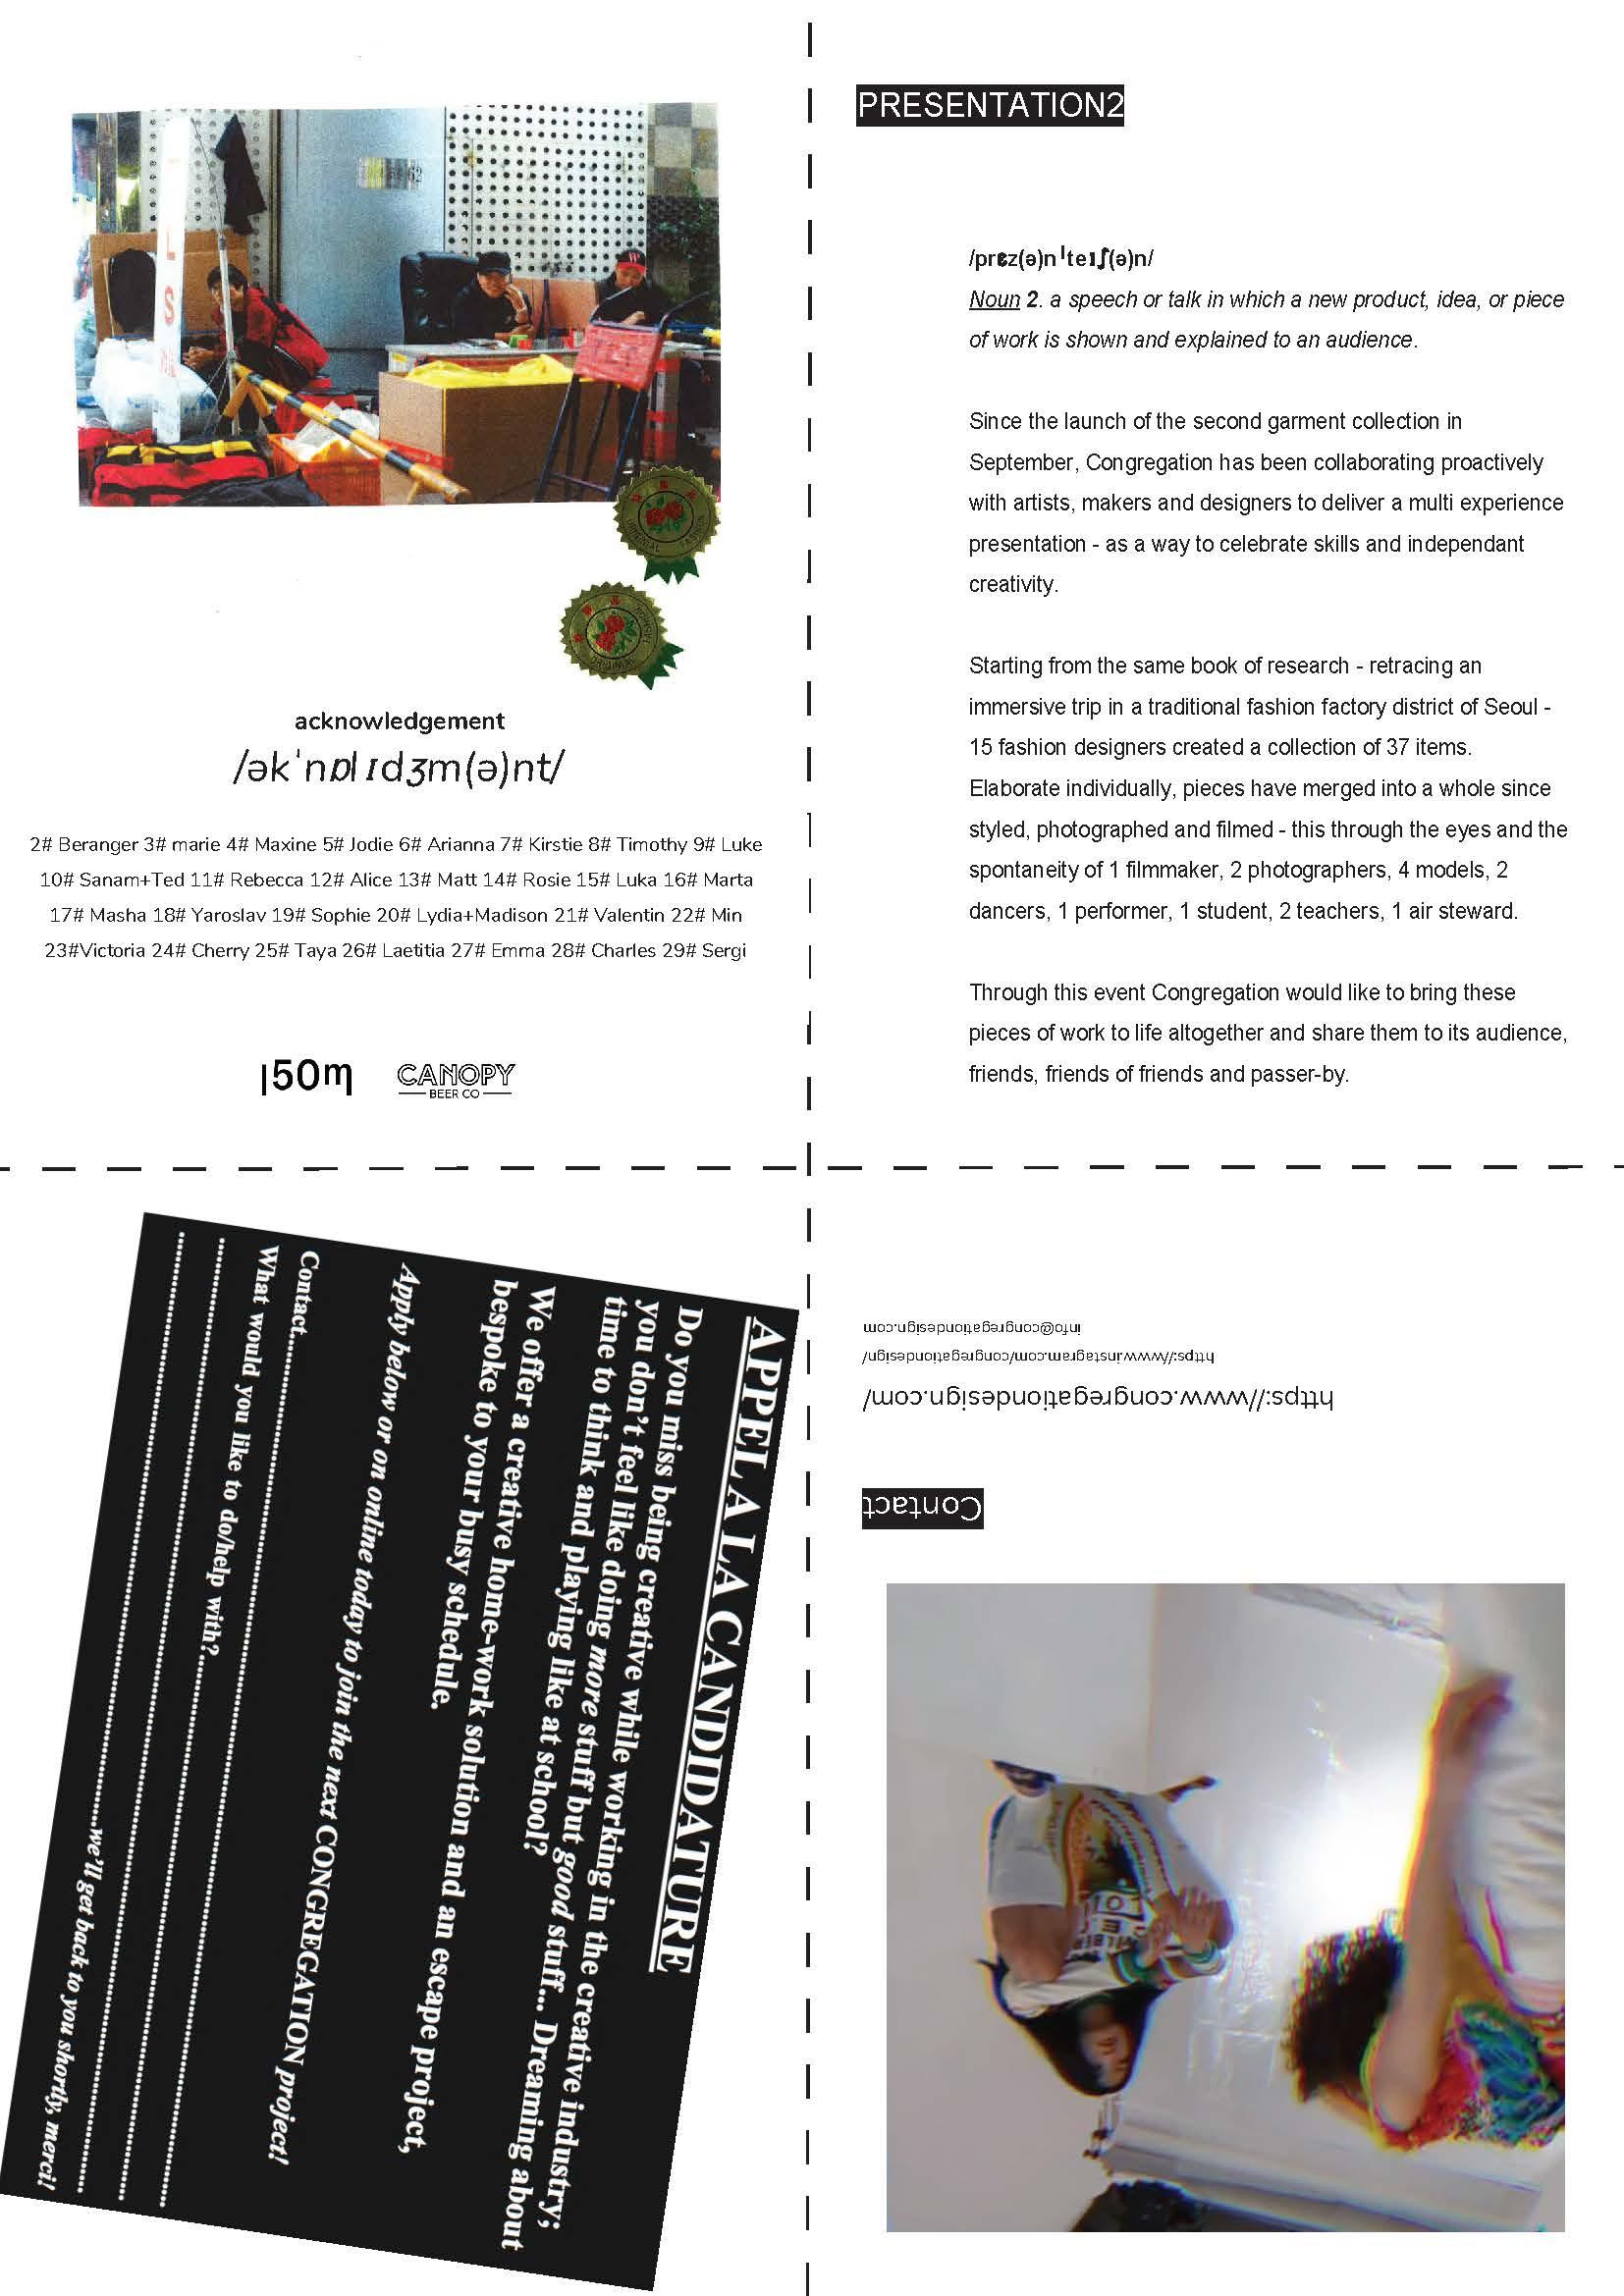 Press Release Presentation2 CONGREGATIONdesign dec2019 _Page_1.jpg